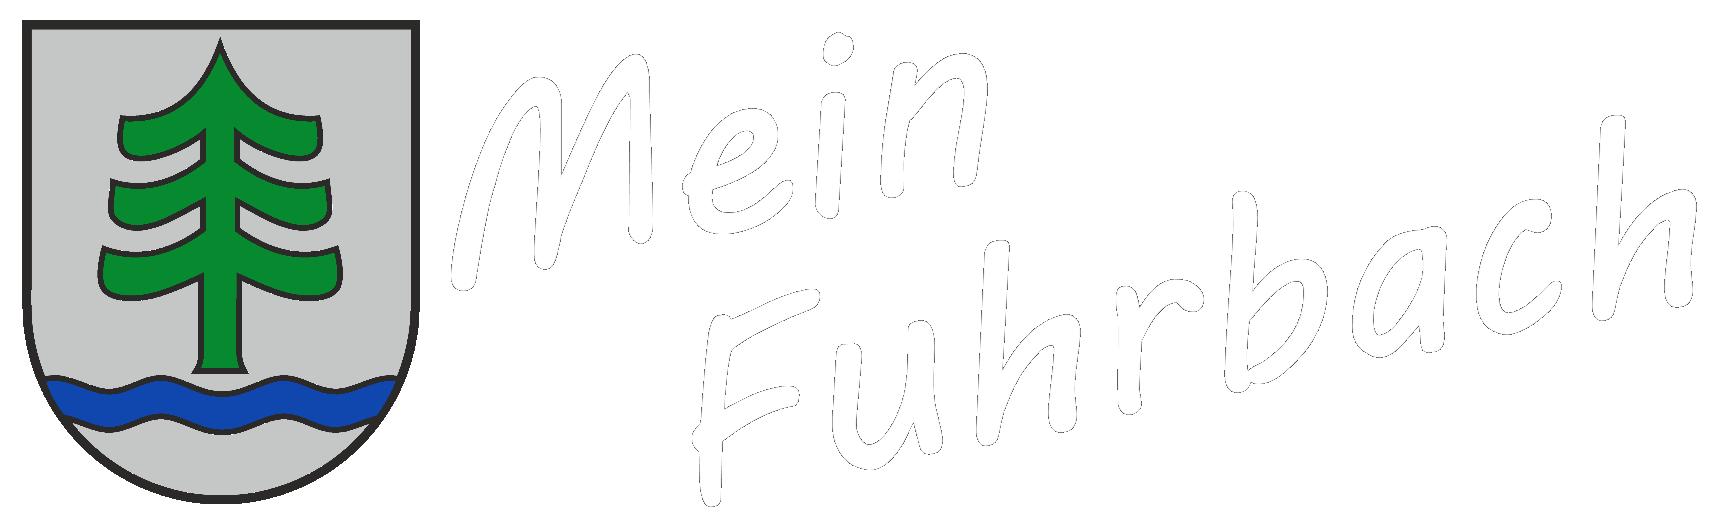 mein Fuhrbach